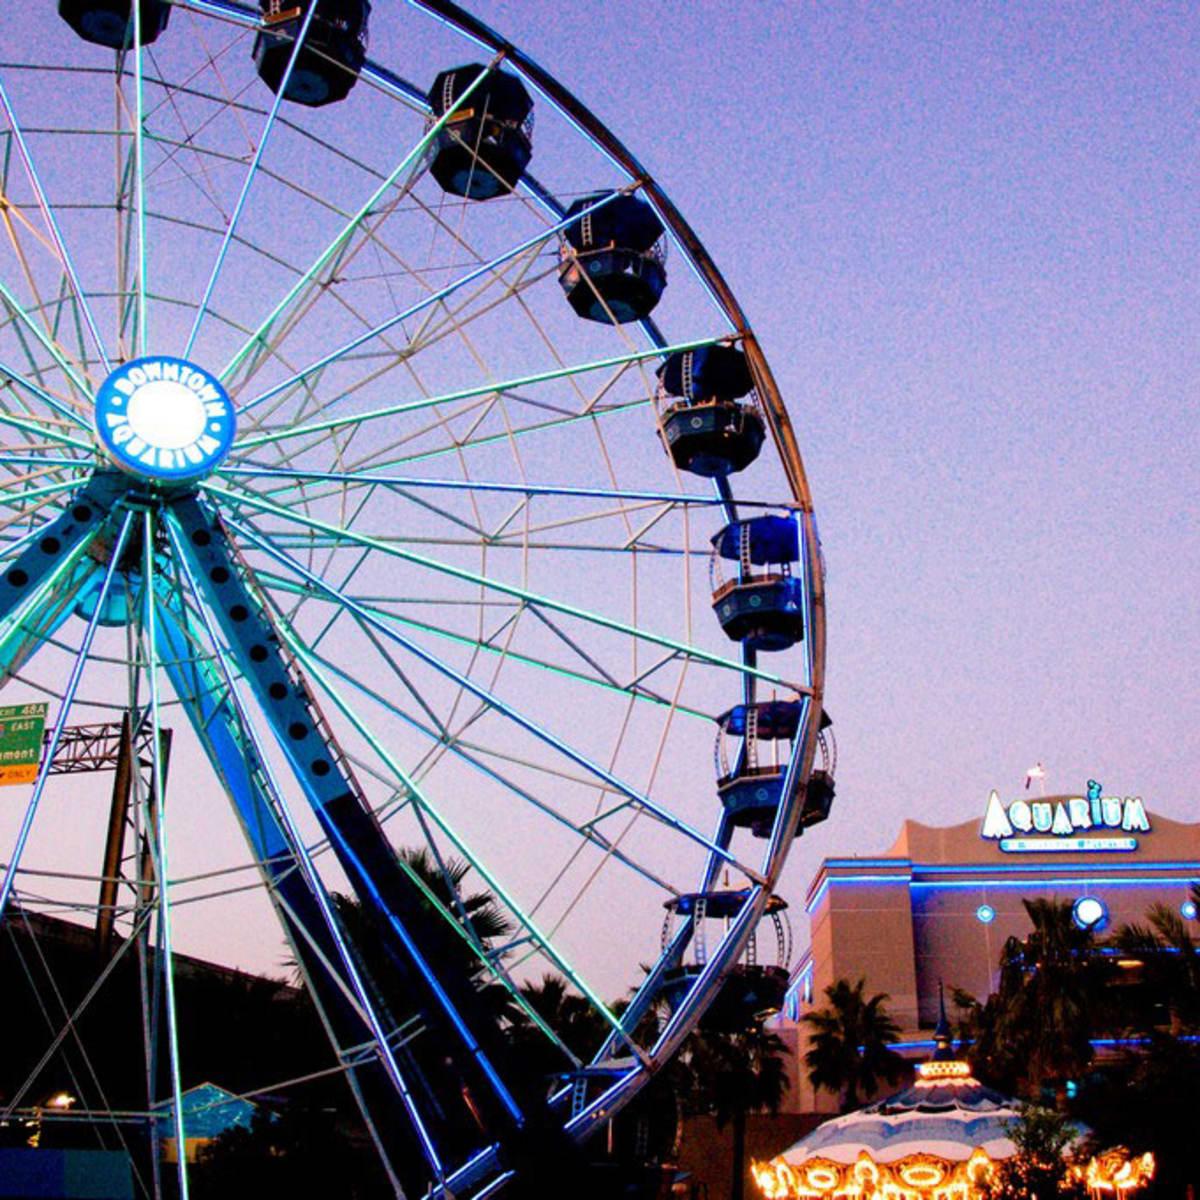 Places-Unique-Downtown Aquarium-Ferris Wheel-1